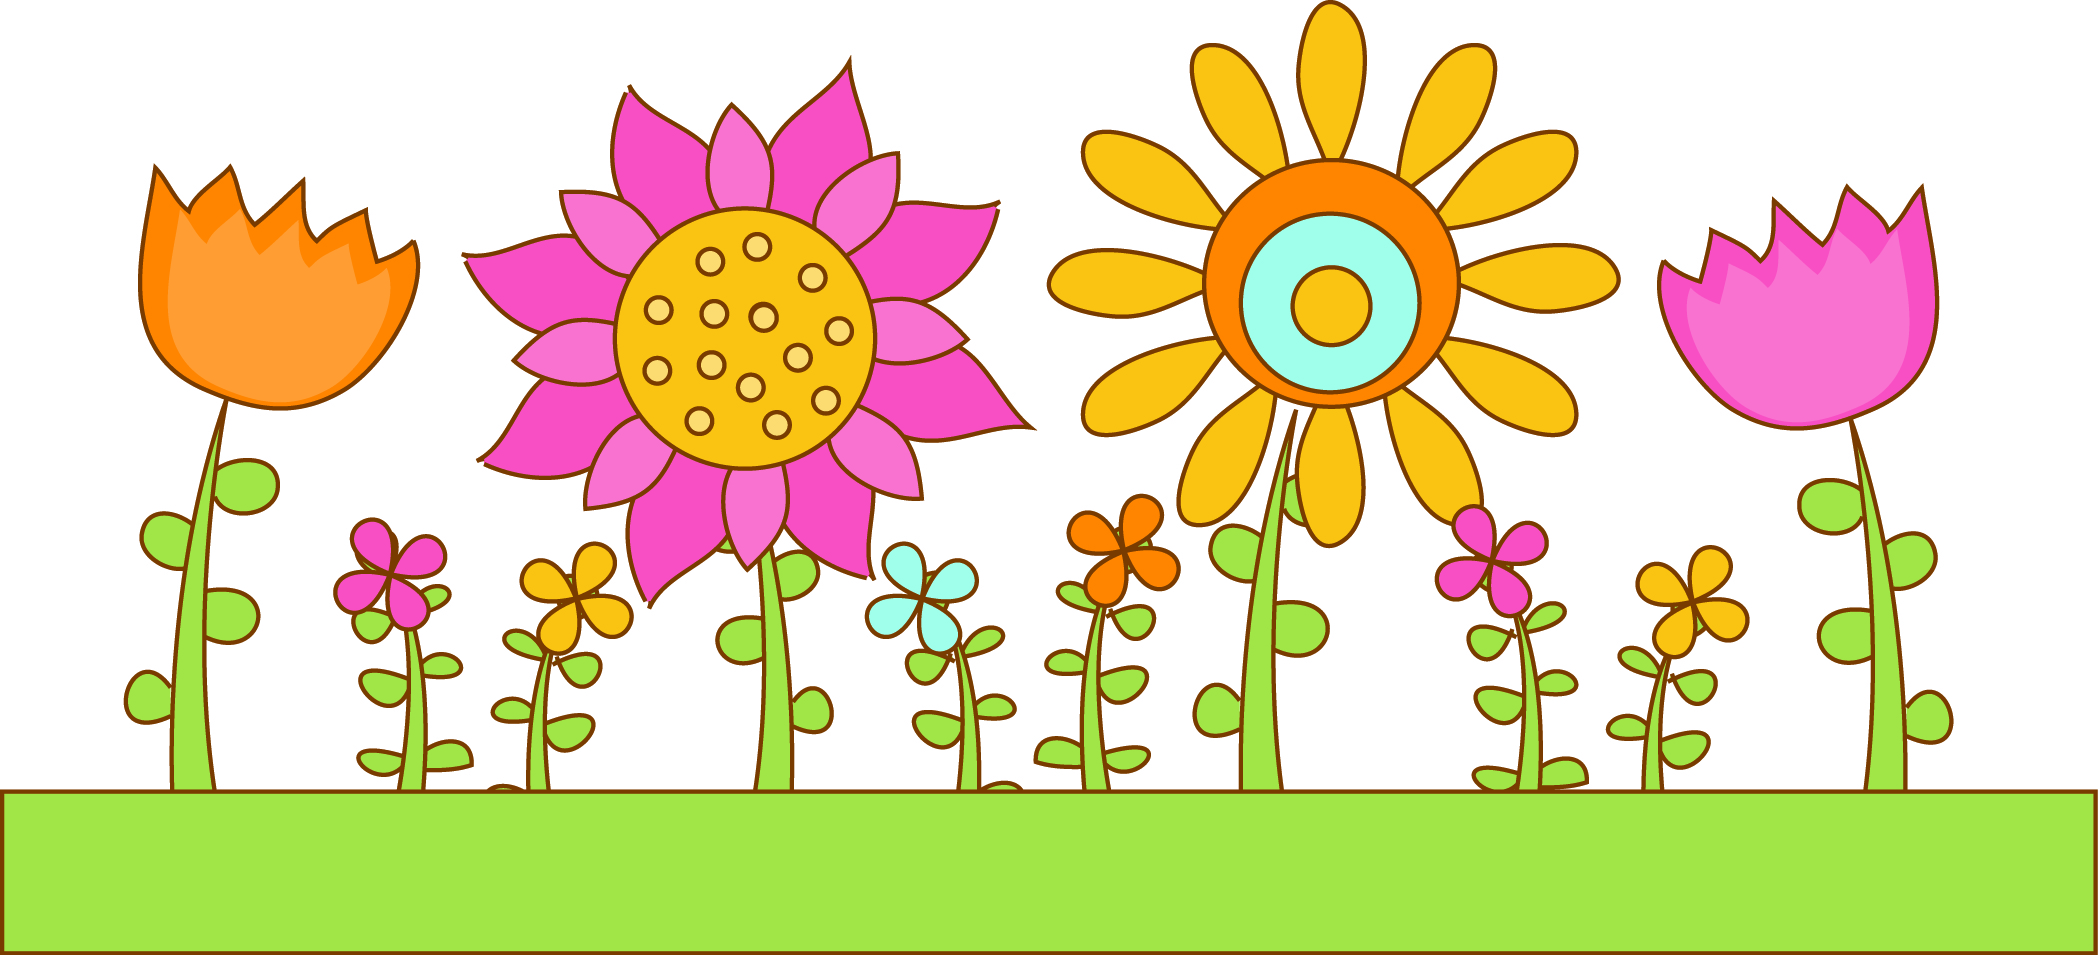 Garden clipart flower garden Cliparts Garden Bed Flower Clipart